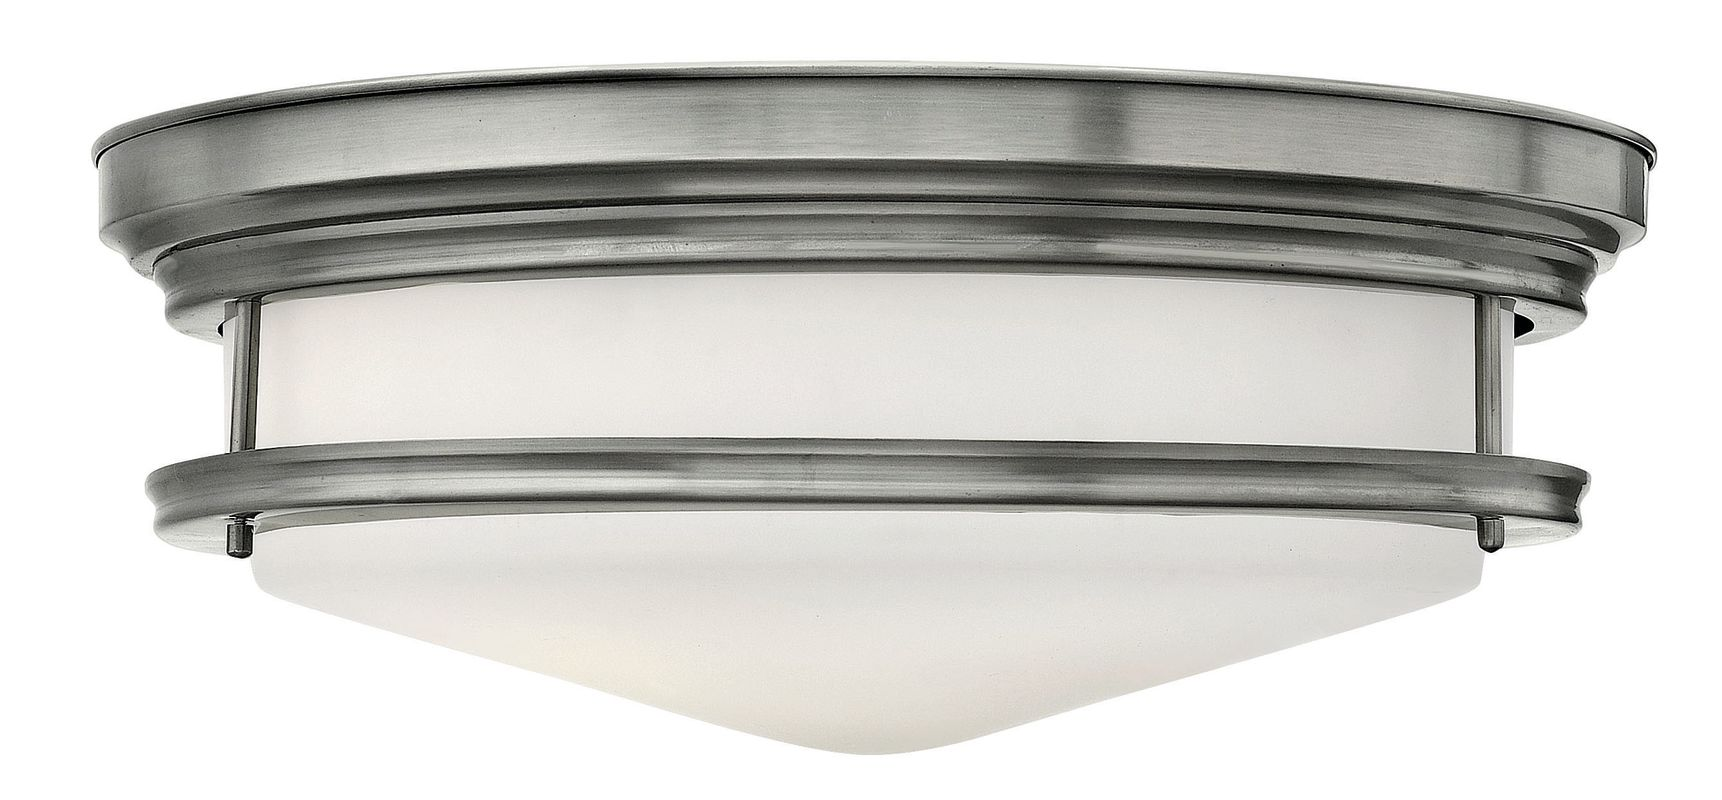 Hinkley Lighting 3304-GU24 4 Light Title 24 Fluorescent Flush Mount Sale $489.00 ITEM#: 2635257 MODEL# :3304AN-GU24 UPC#: 640665330601 :